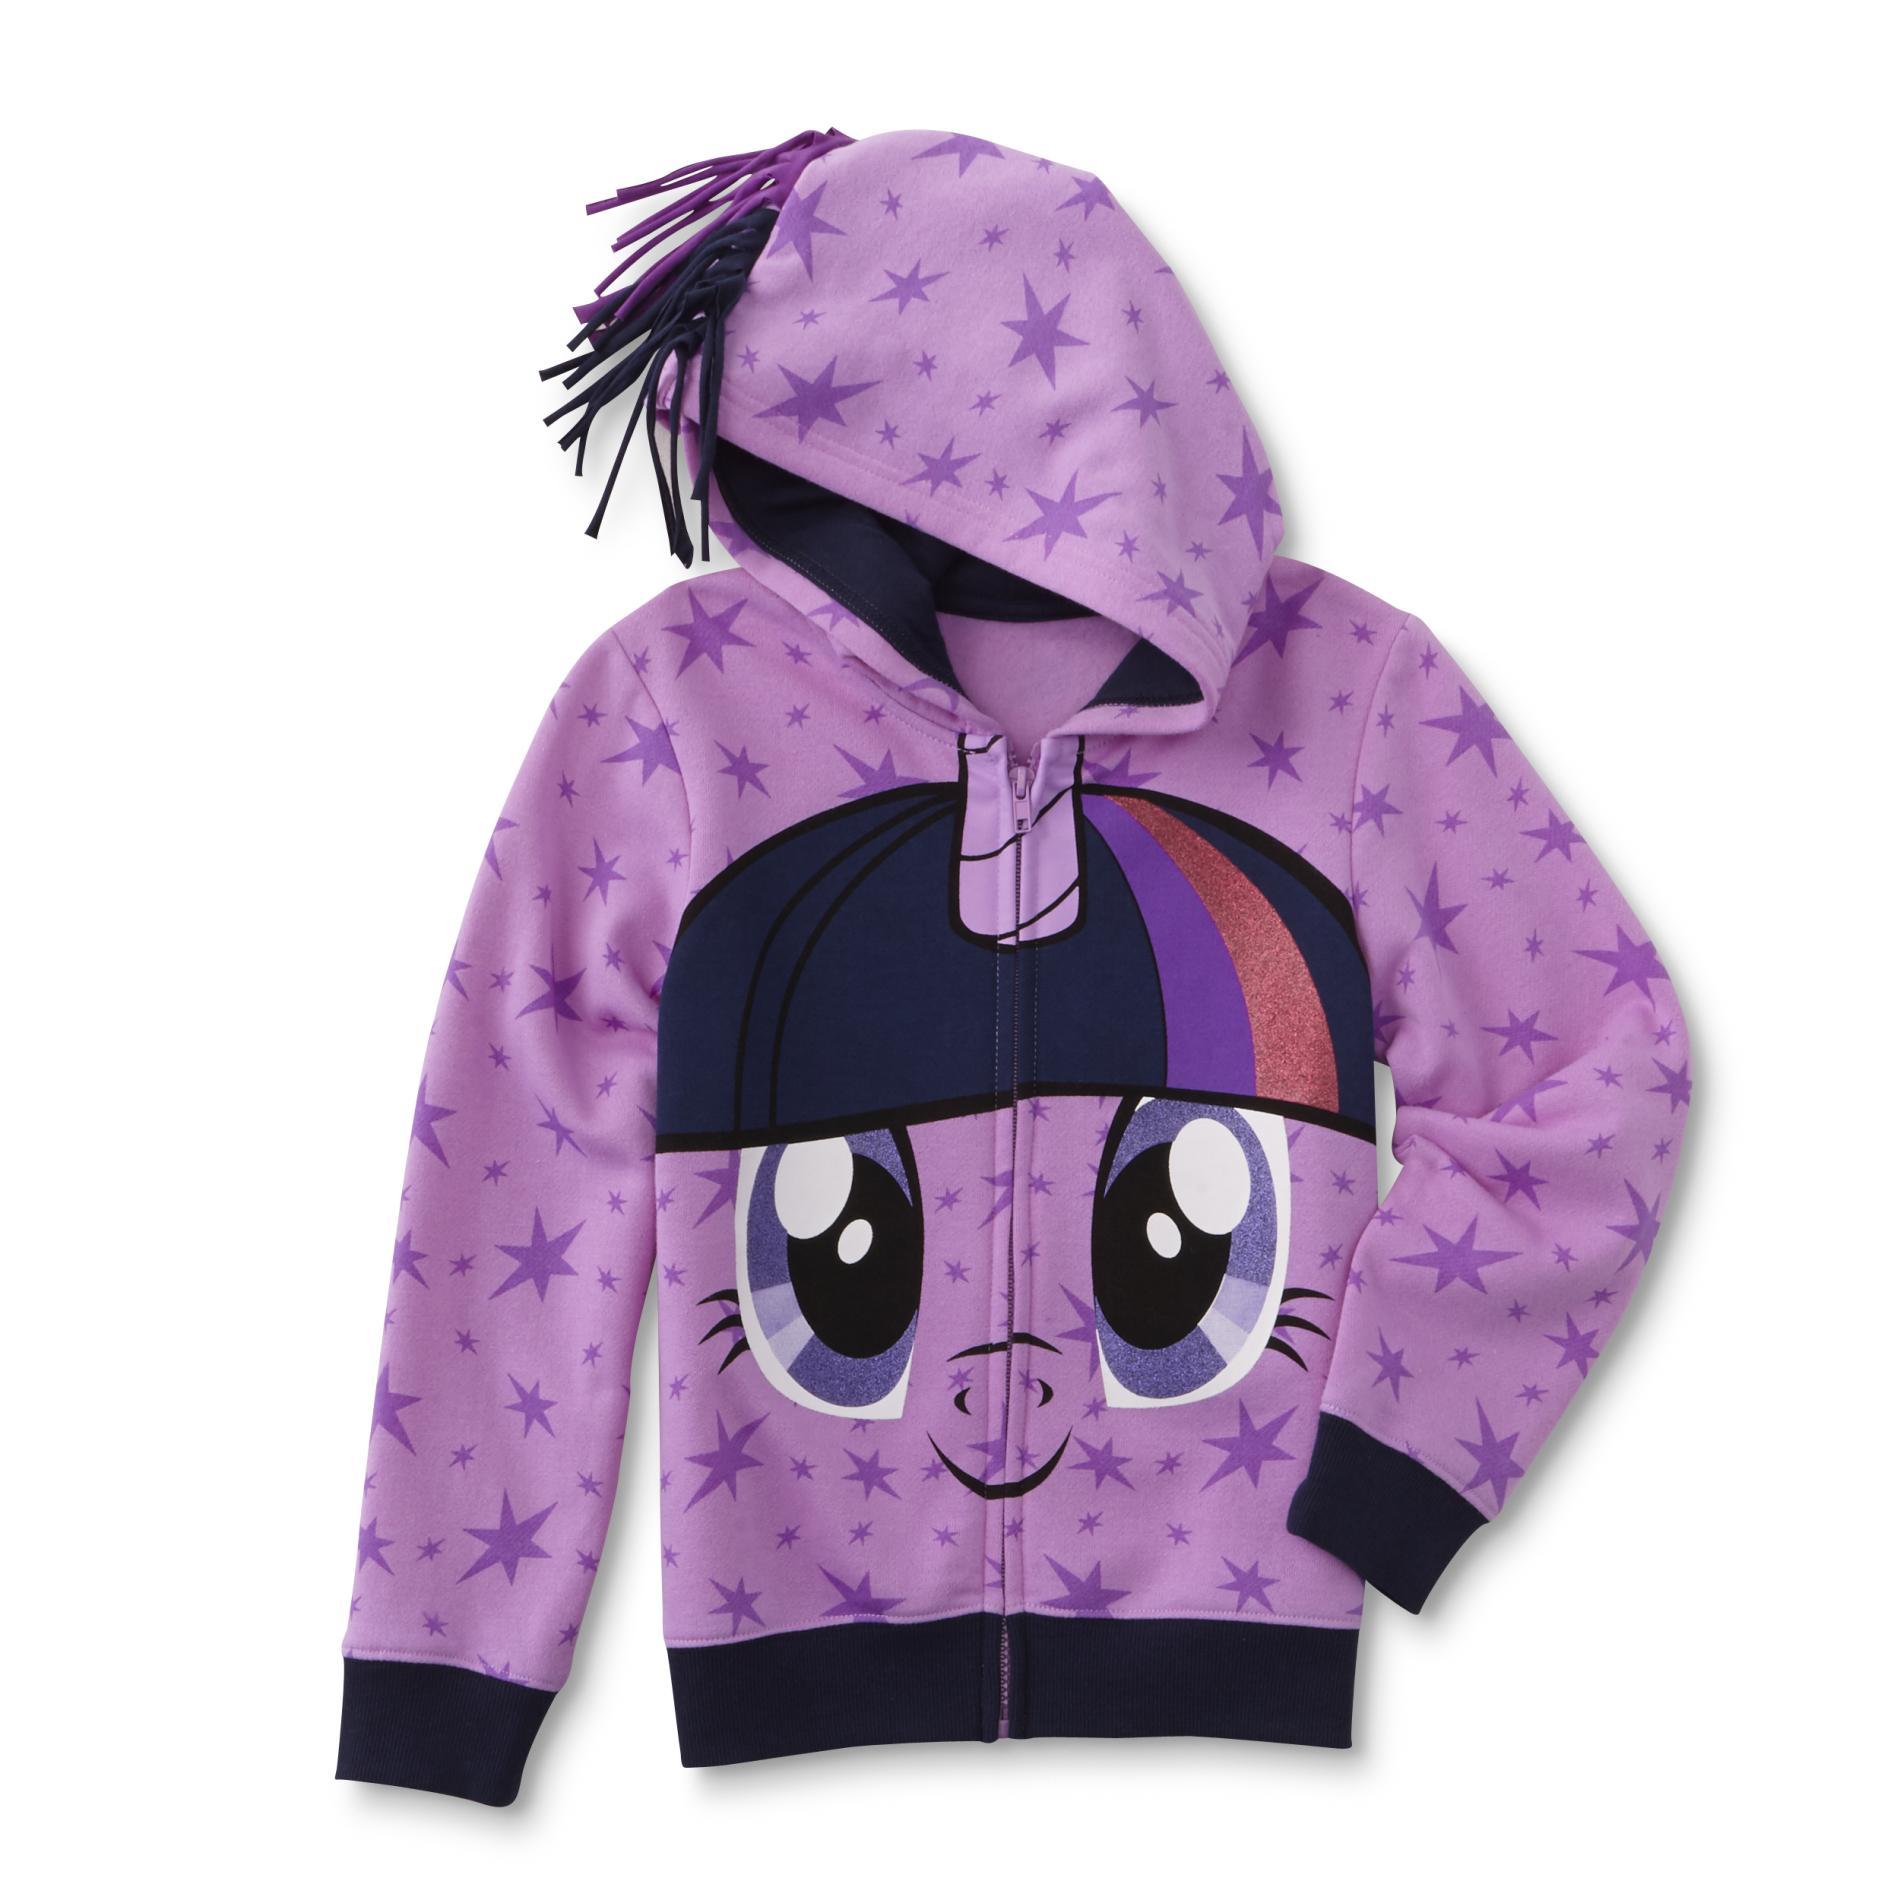 Little Pony Girl' Hoodie Jacket - Twilight Sparkle Kmart